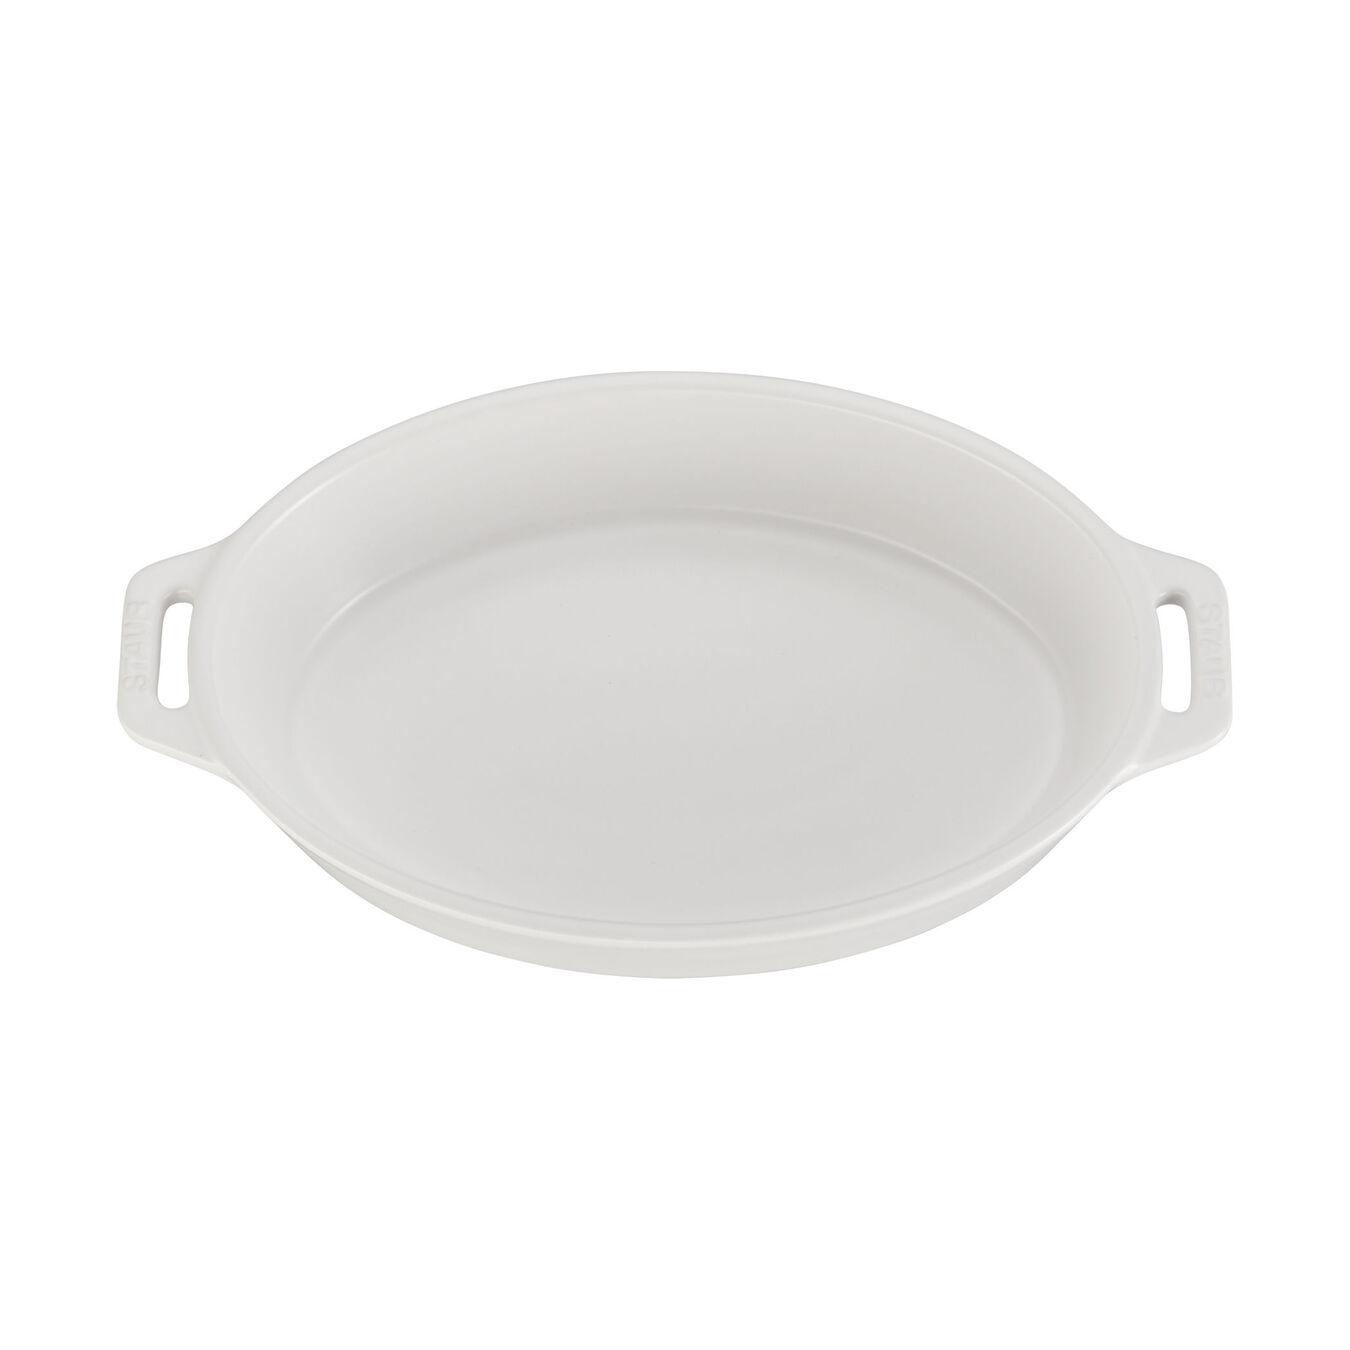 Ceramic oval Plat empilable, Matte-White,,large 2